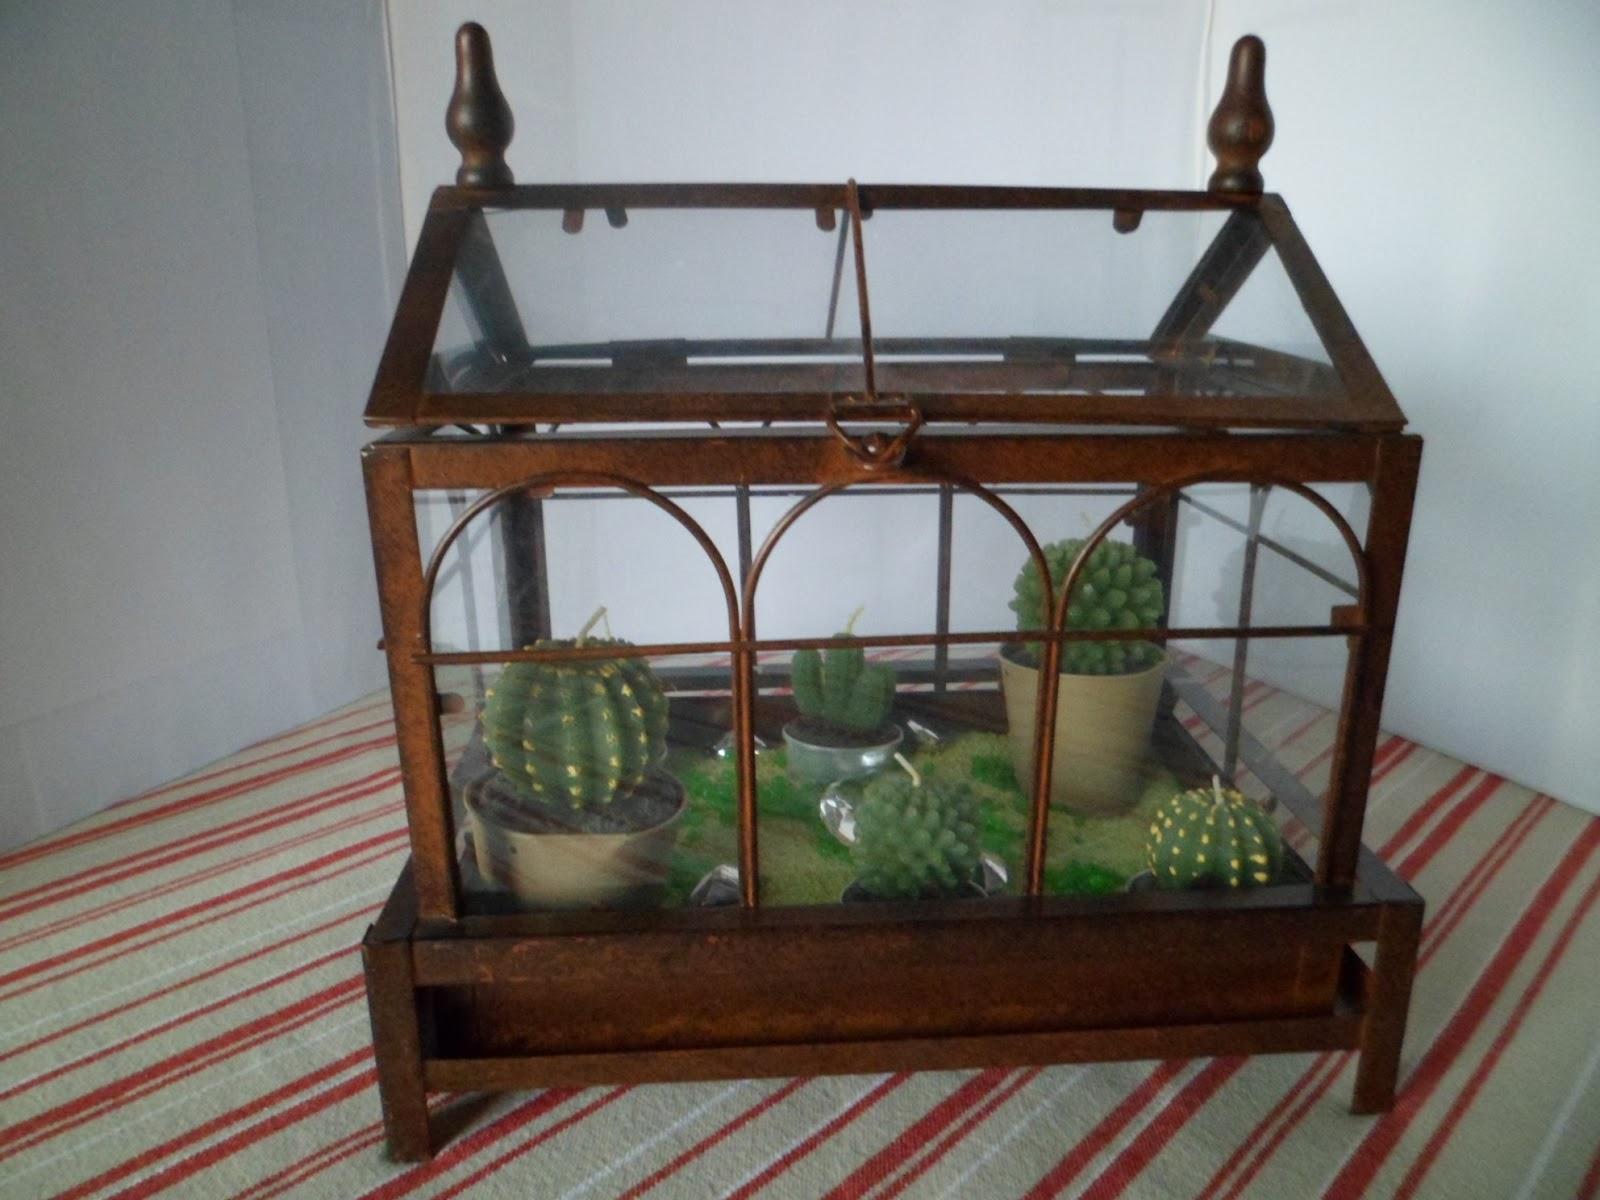 ma vie d co serre cactus sans entretien. Black Bedroom Furniture Sets. Home Design Ideas